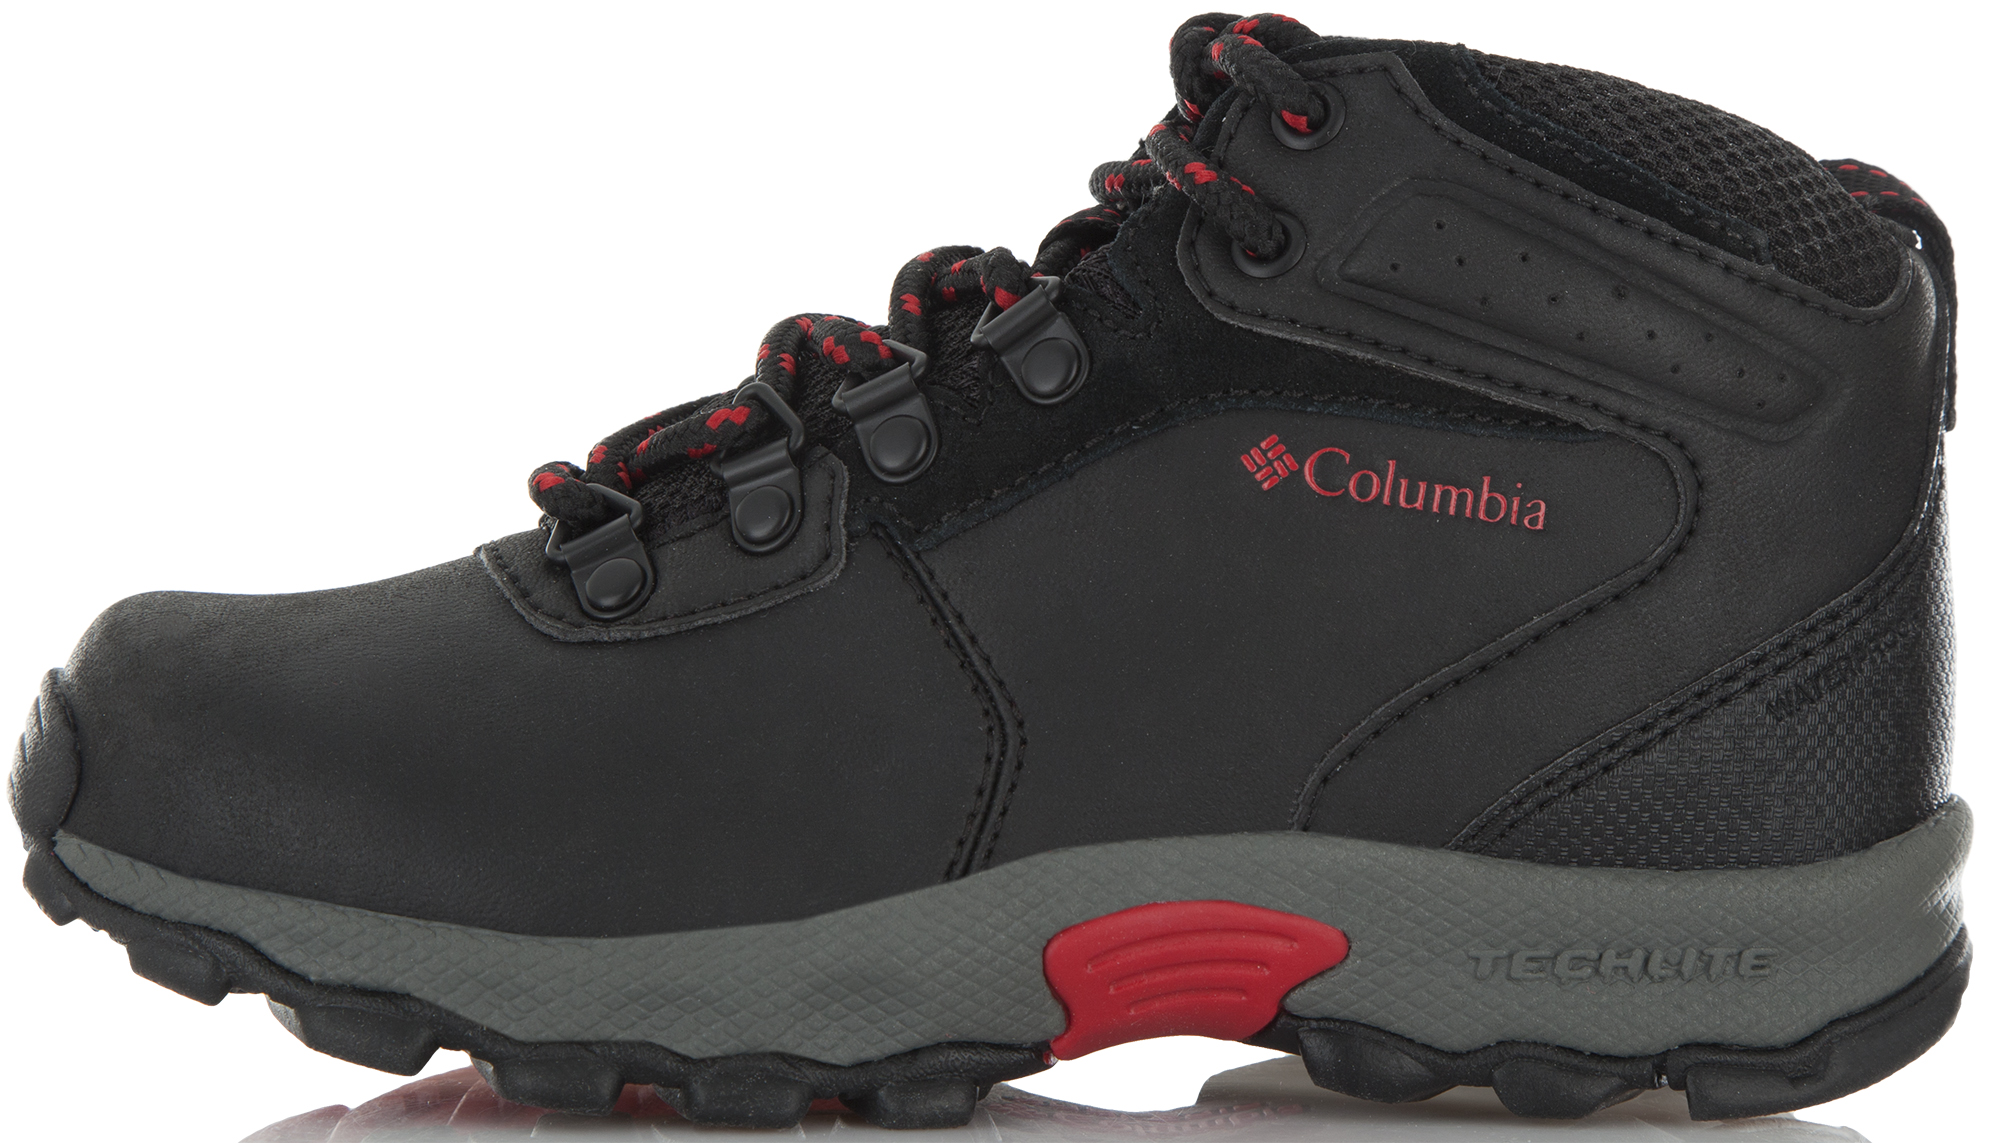 Columbia Ботинки для мальчиков Columbia Youth Newton Ridge